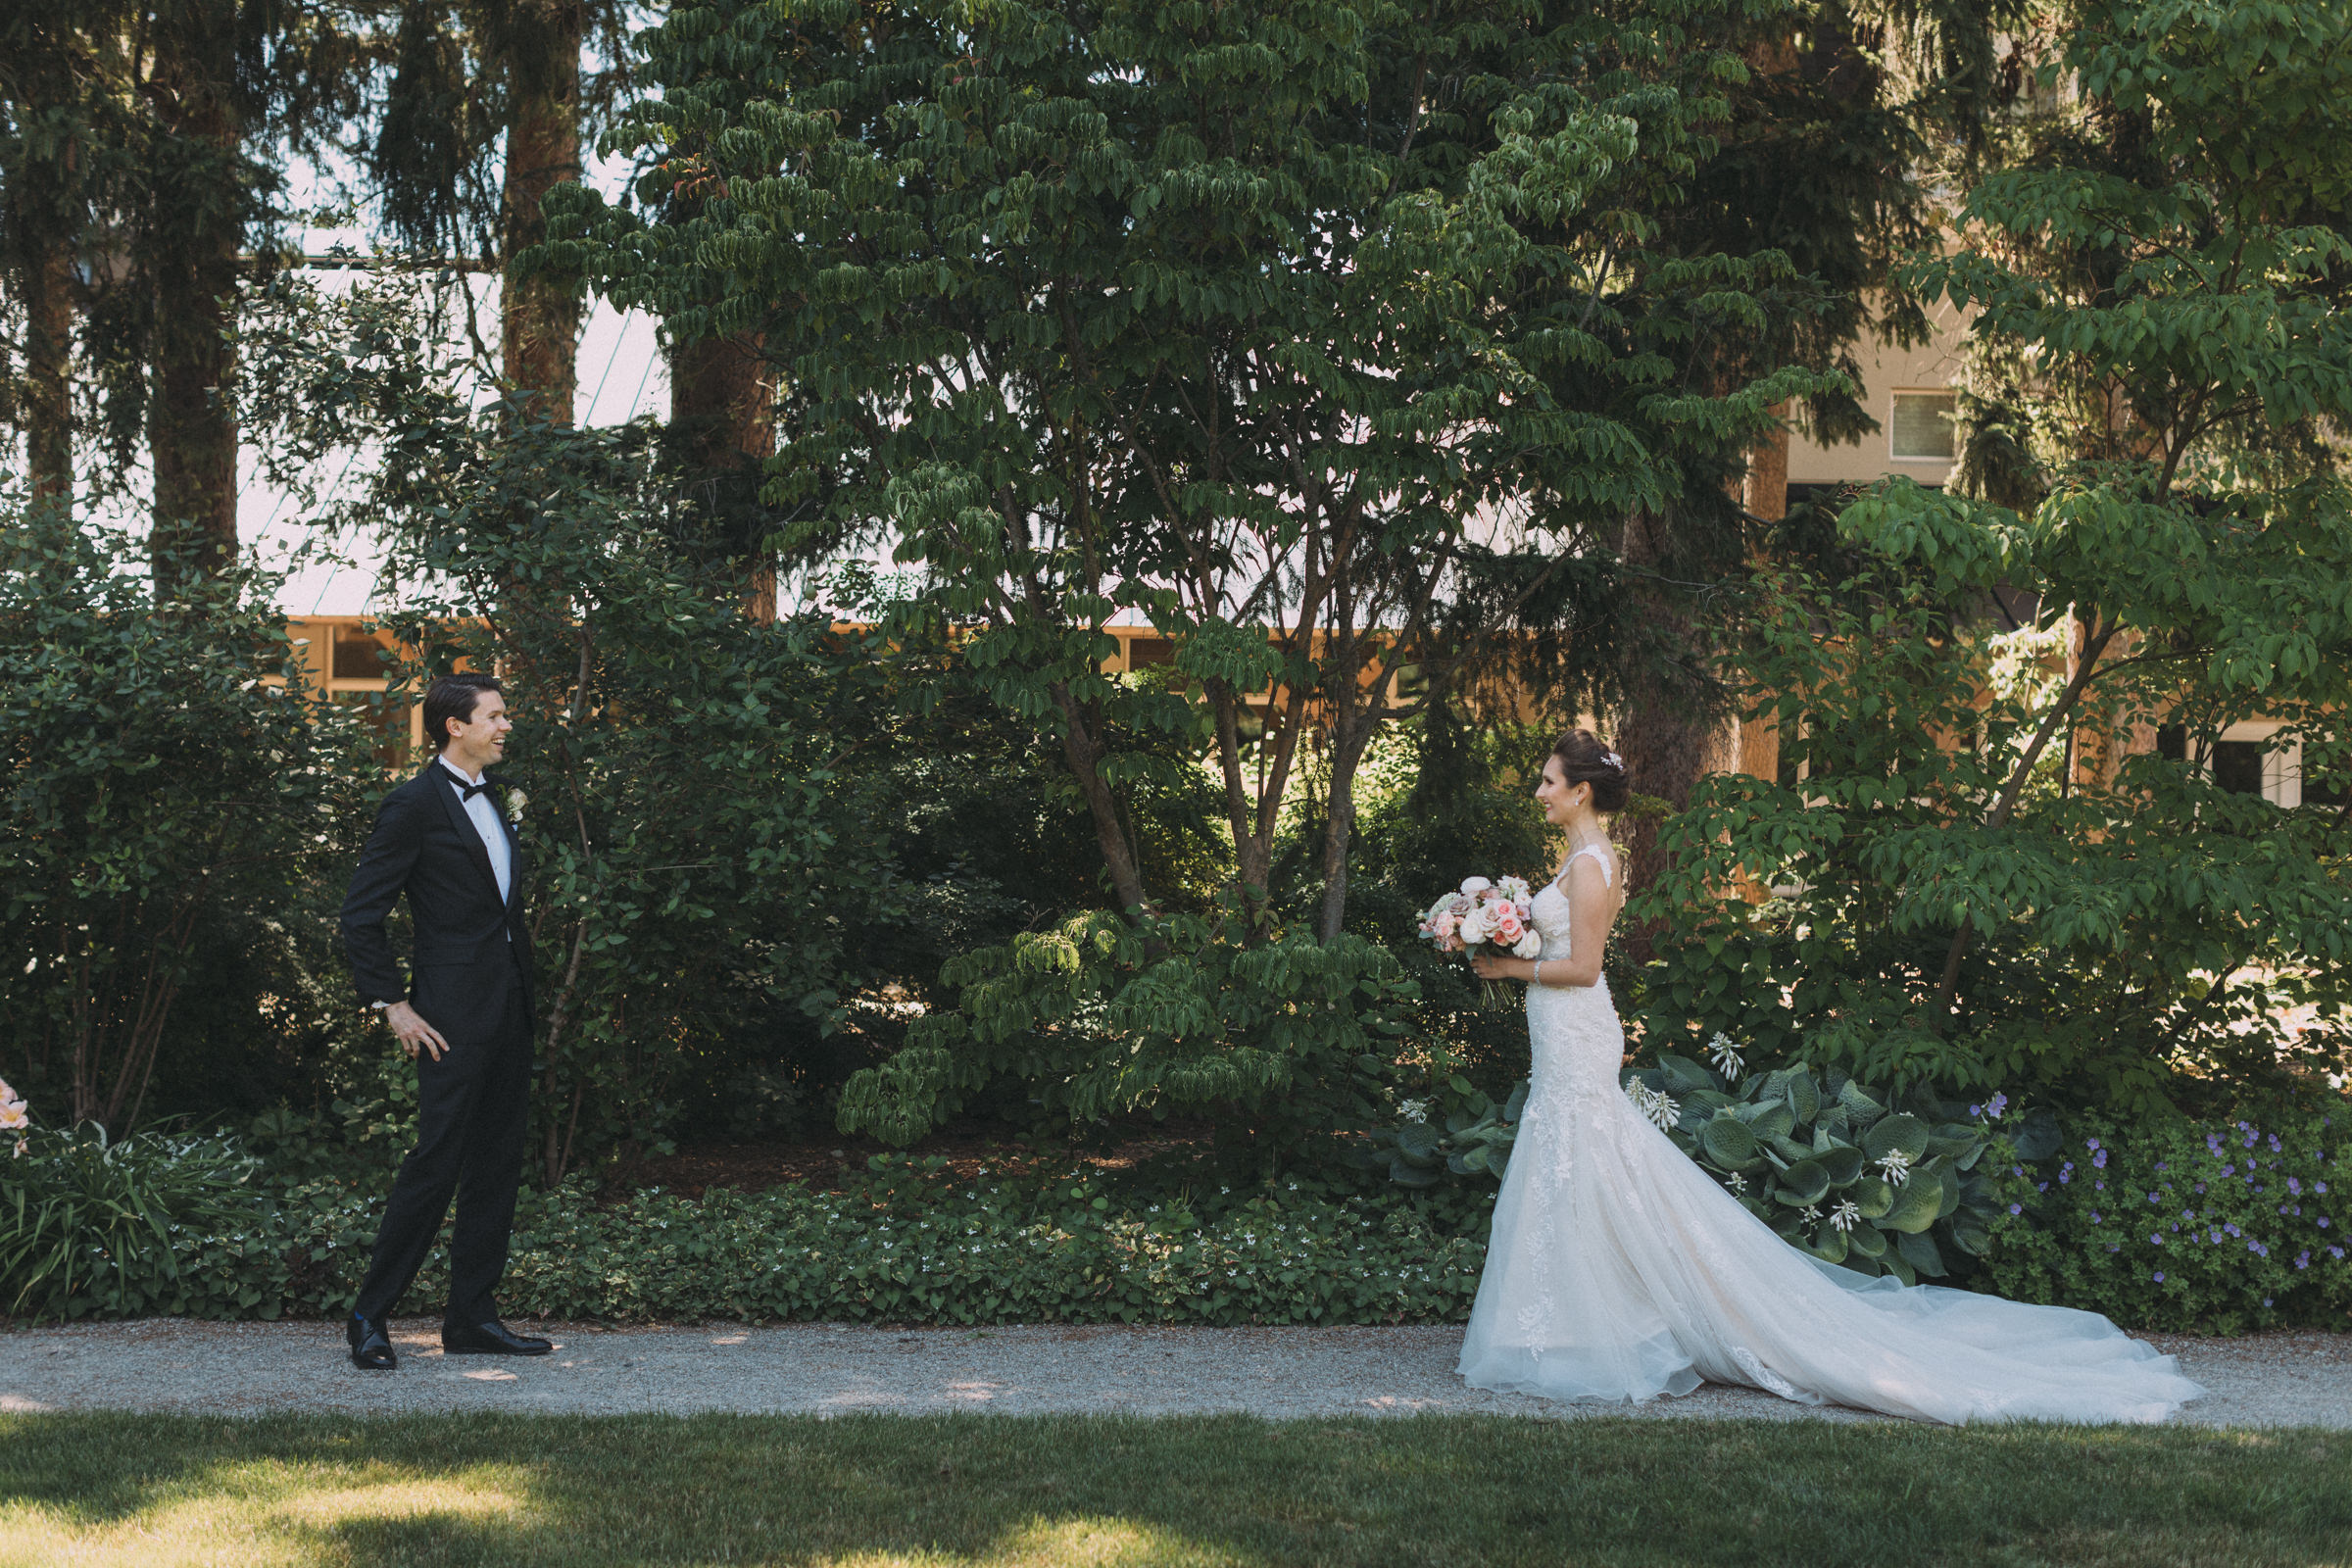 Langdon-Hall-wedding-photography-Cambridge-by-Sam-Wong-of-Visual-Cravings_Sarah-Ryan_17.jpg